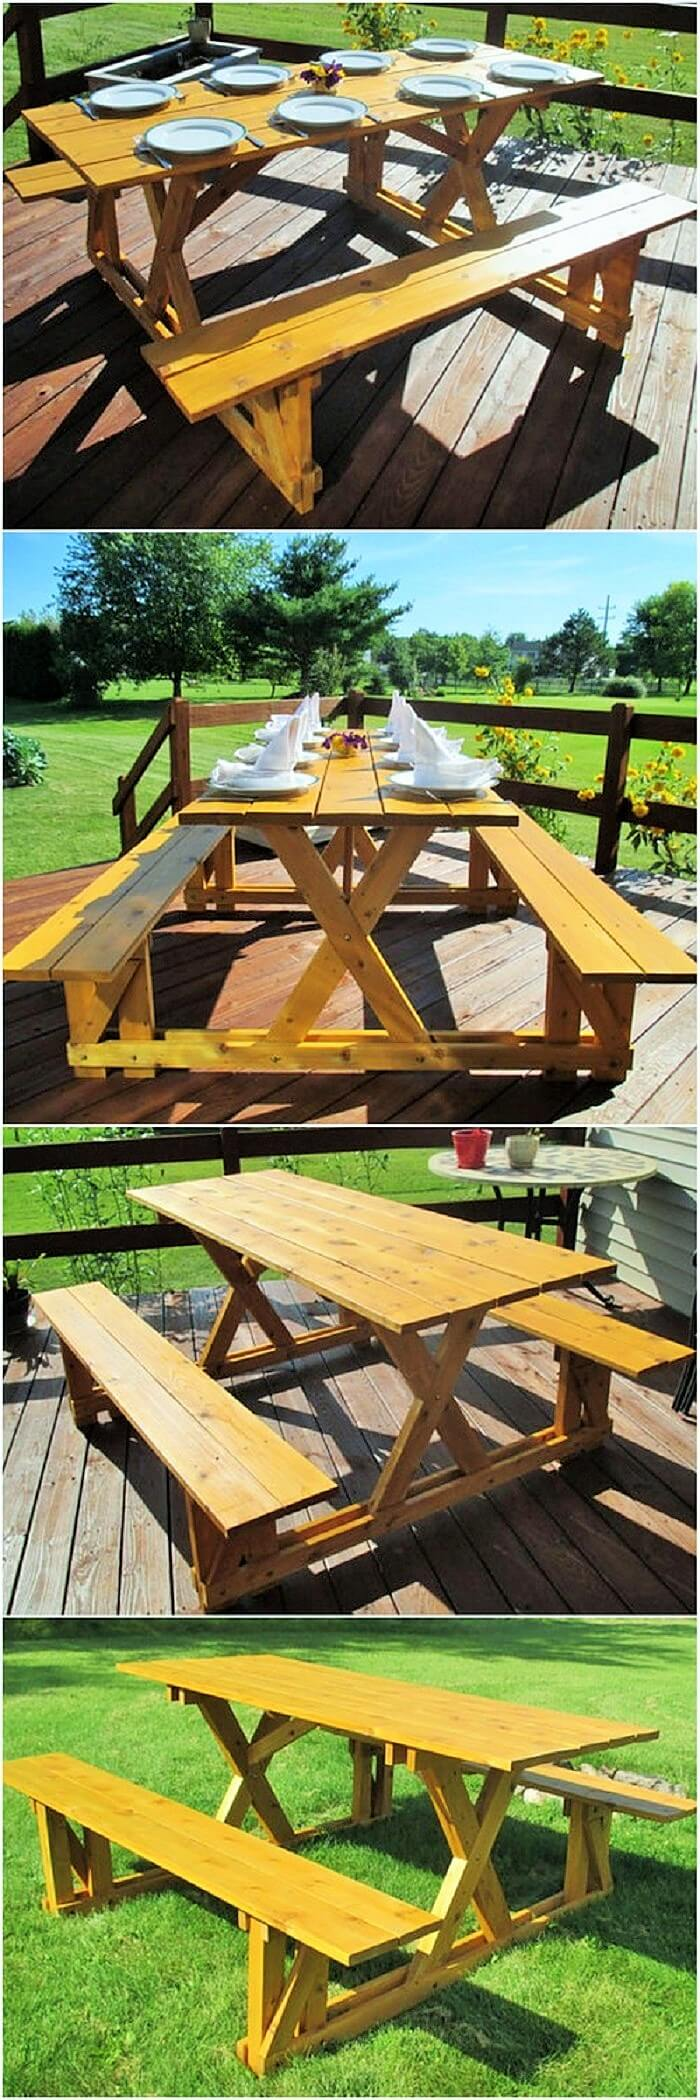 DIY-Wodden-Pallet-Furniture-Projects-20 (2)